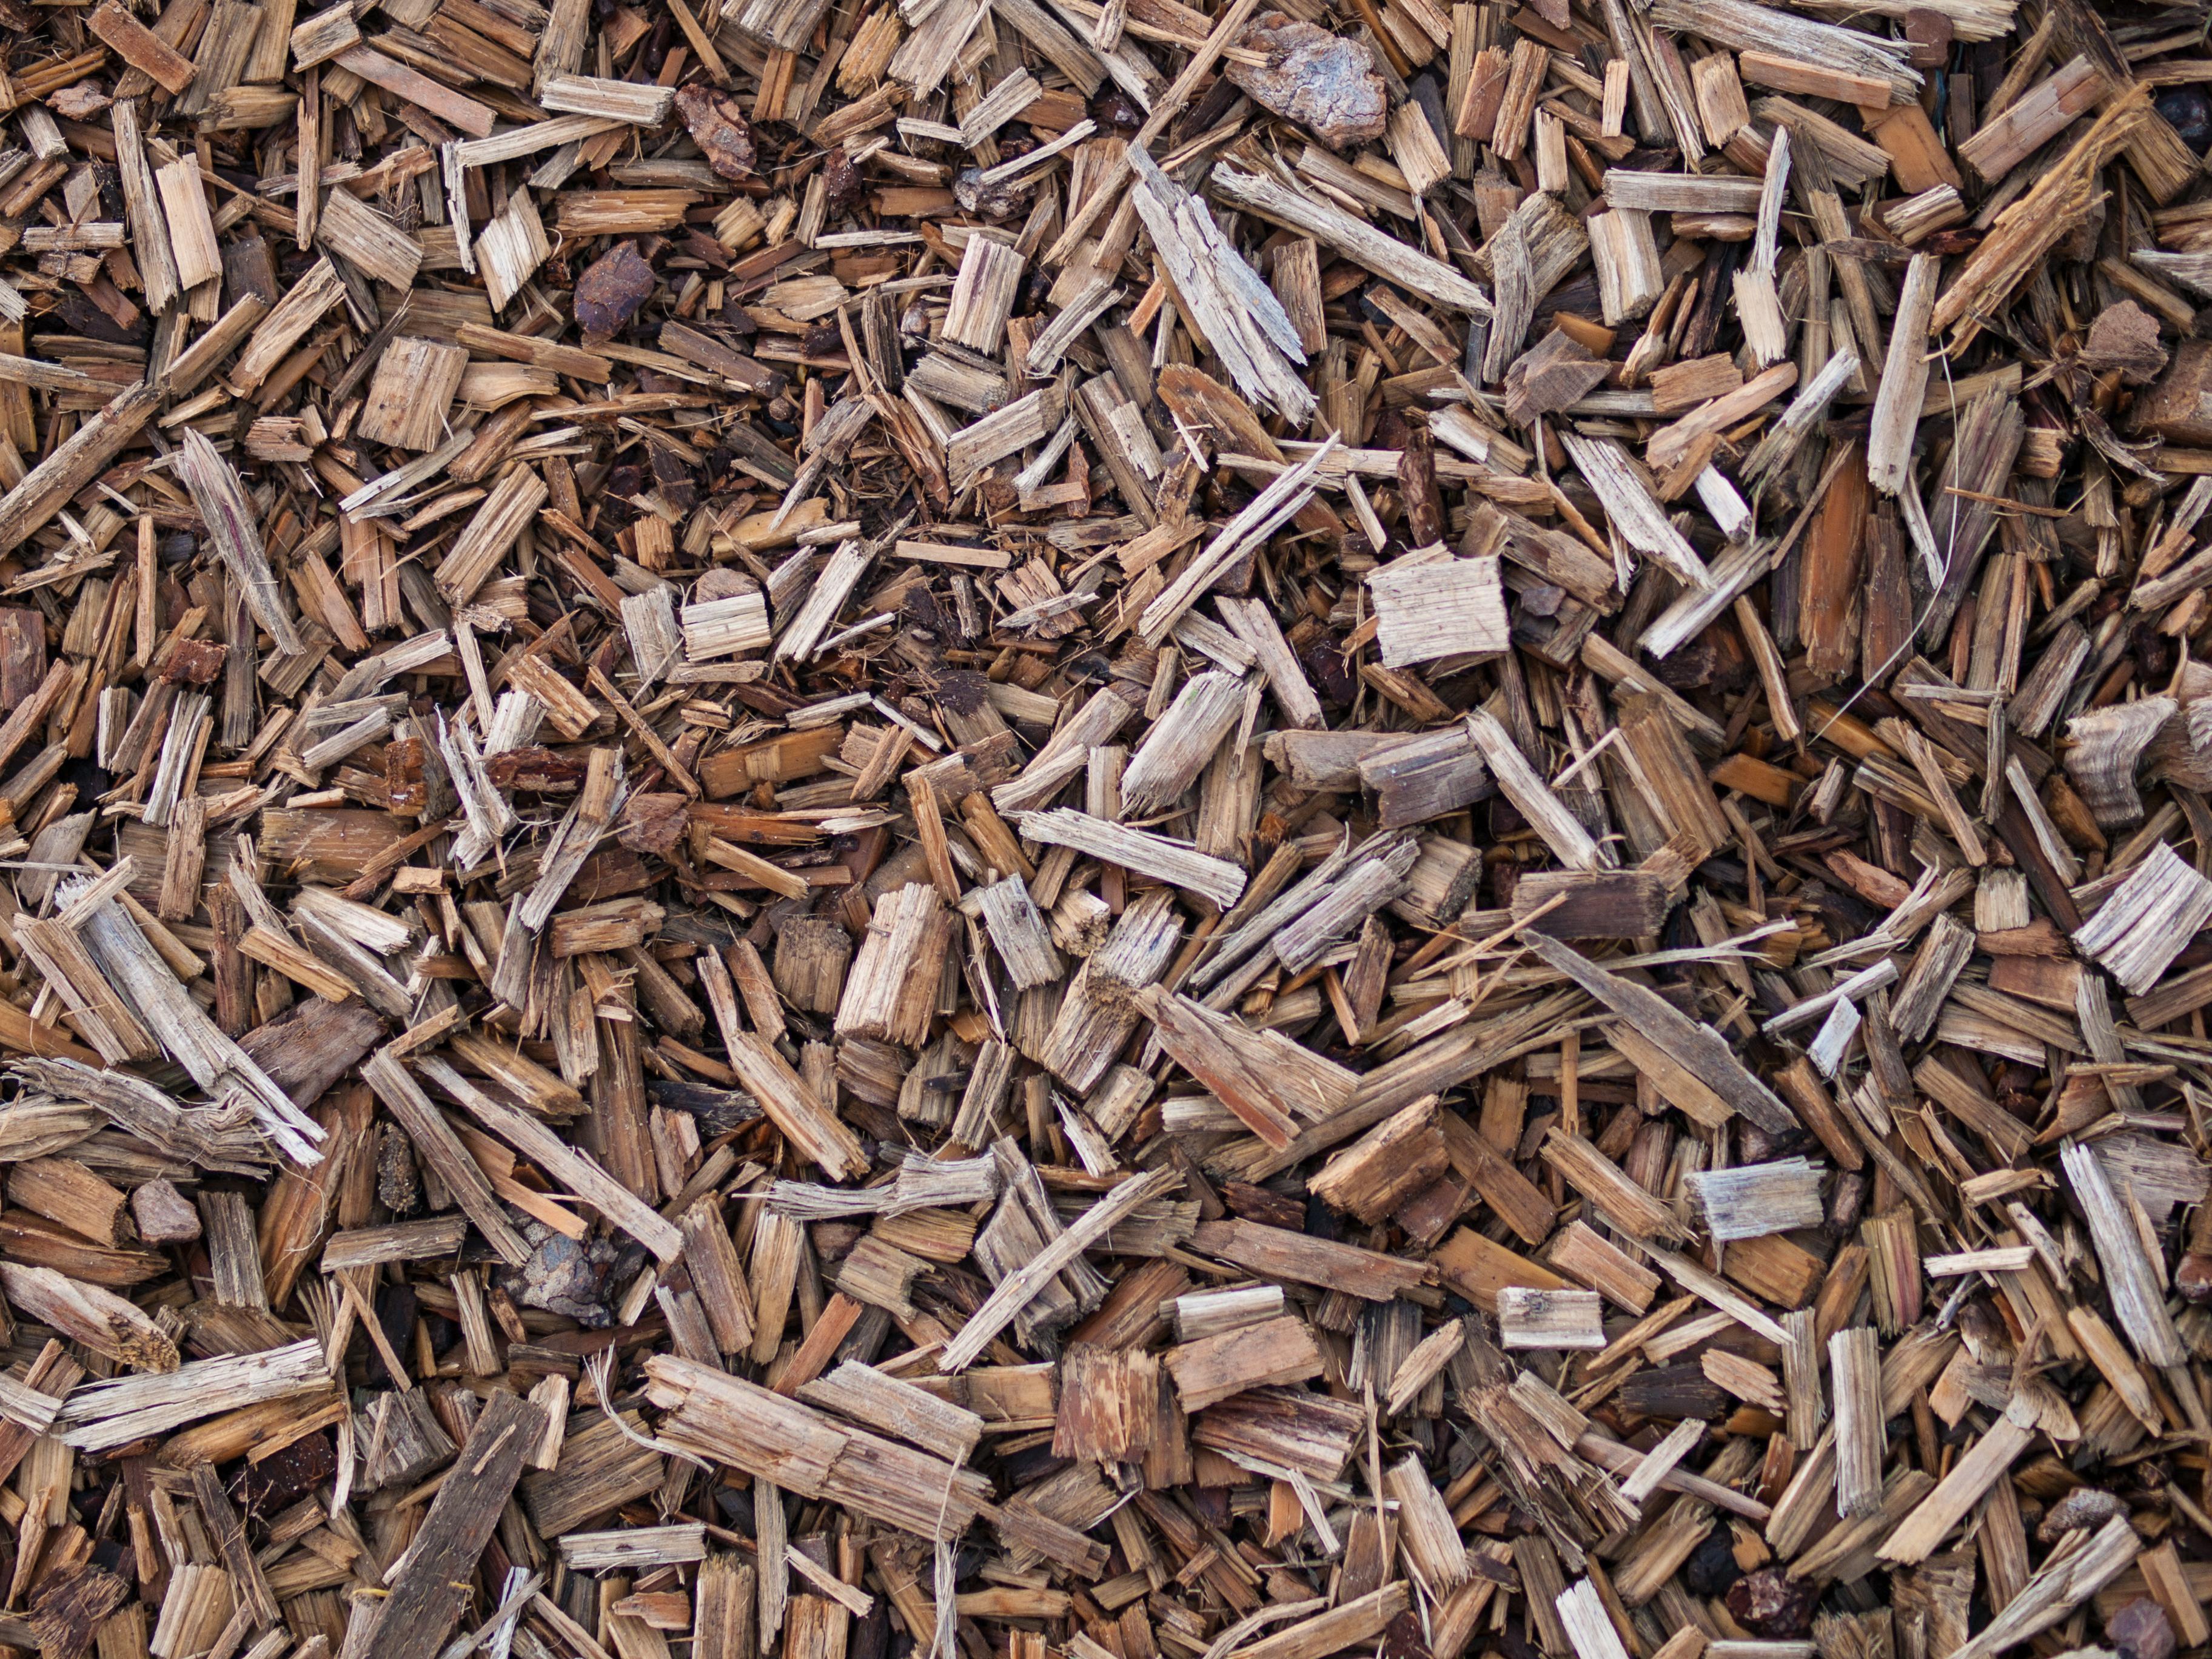 Fine Wood Chipper